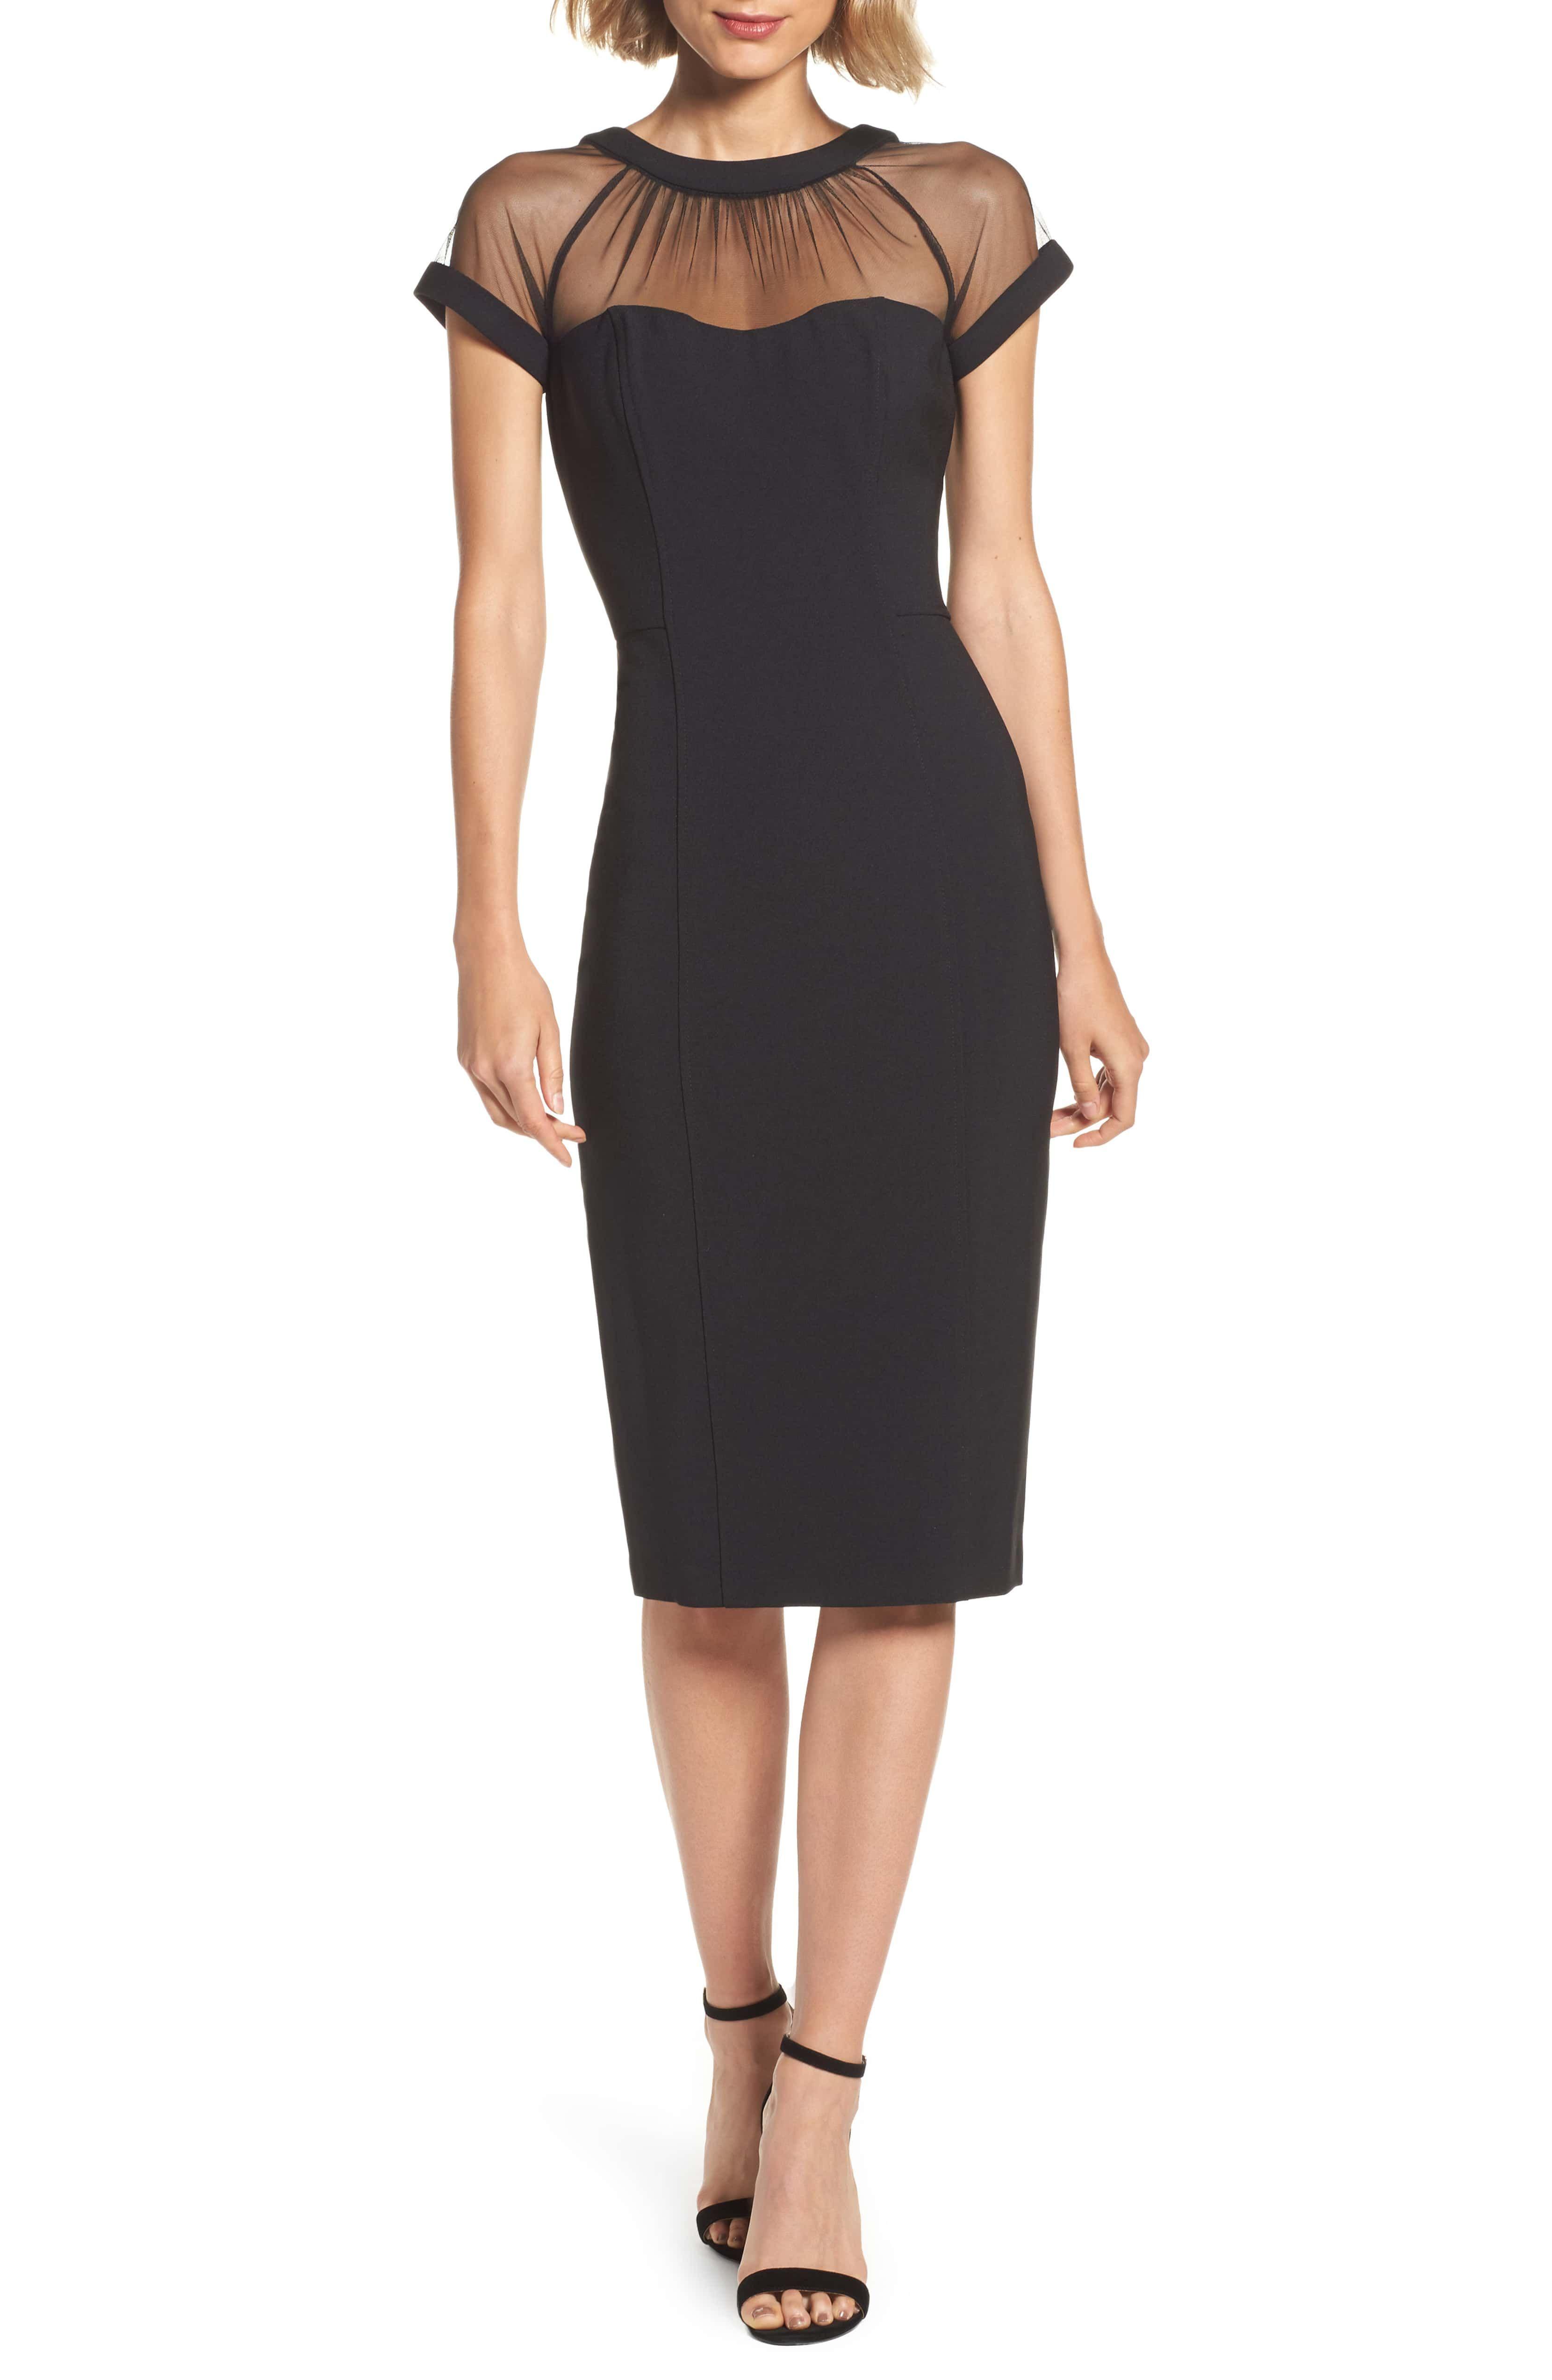 e08f71e1 MAGGY LONDON Illusion Yoke Crepe Sheath Dress, Main, color, BLACK ...